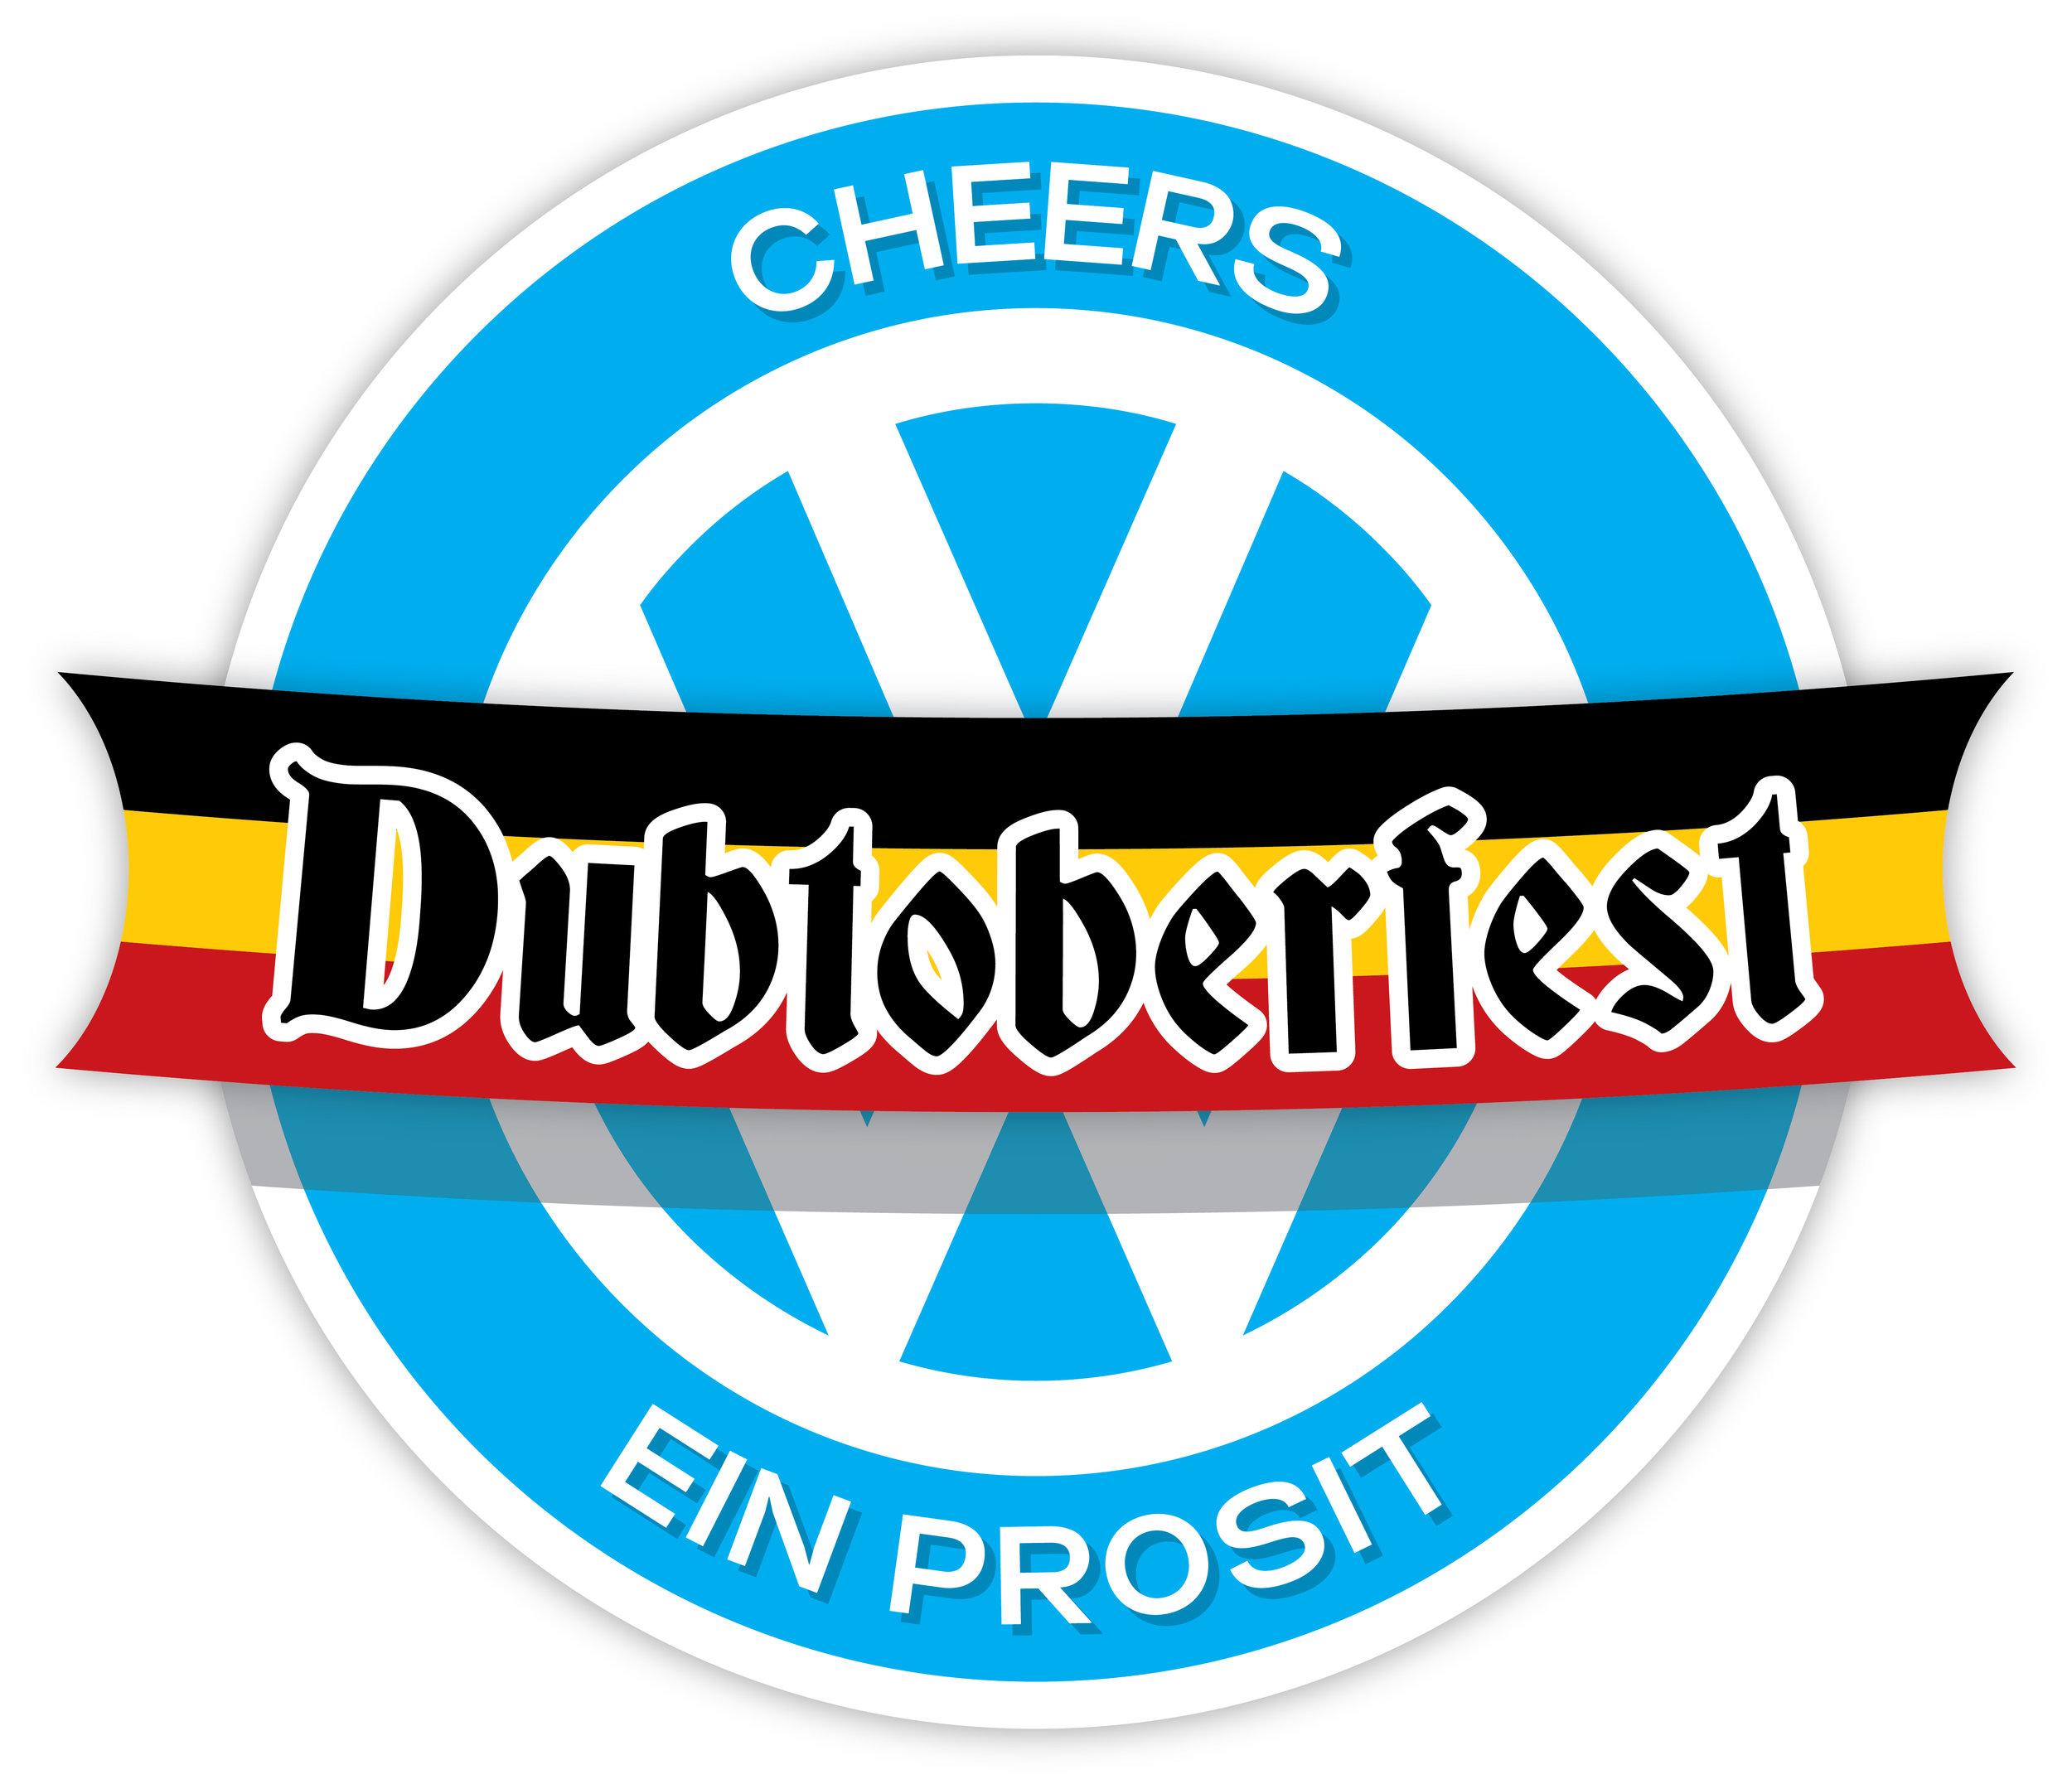 HI RES_Dubtoberfest_logo_hi-res_01-01.jpg